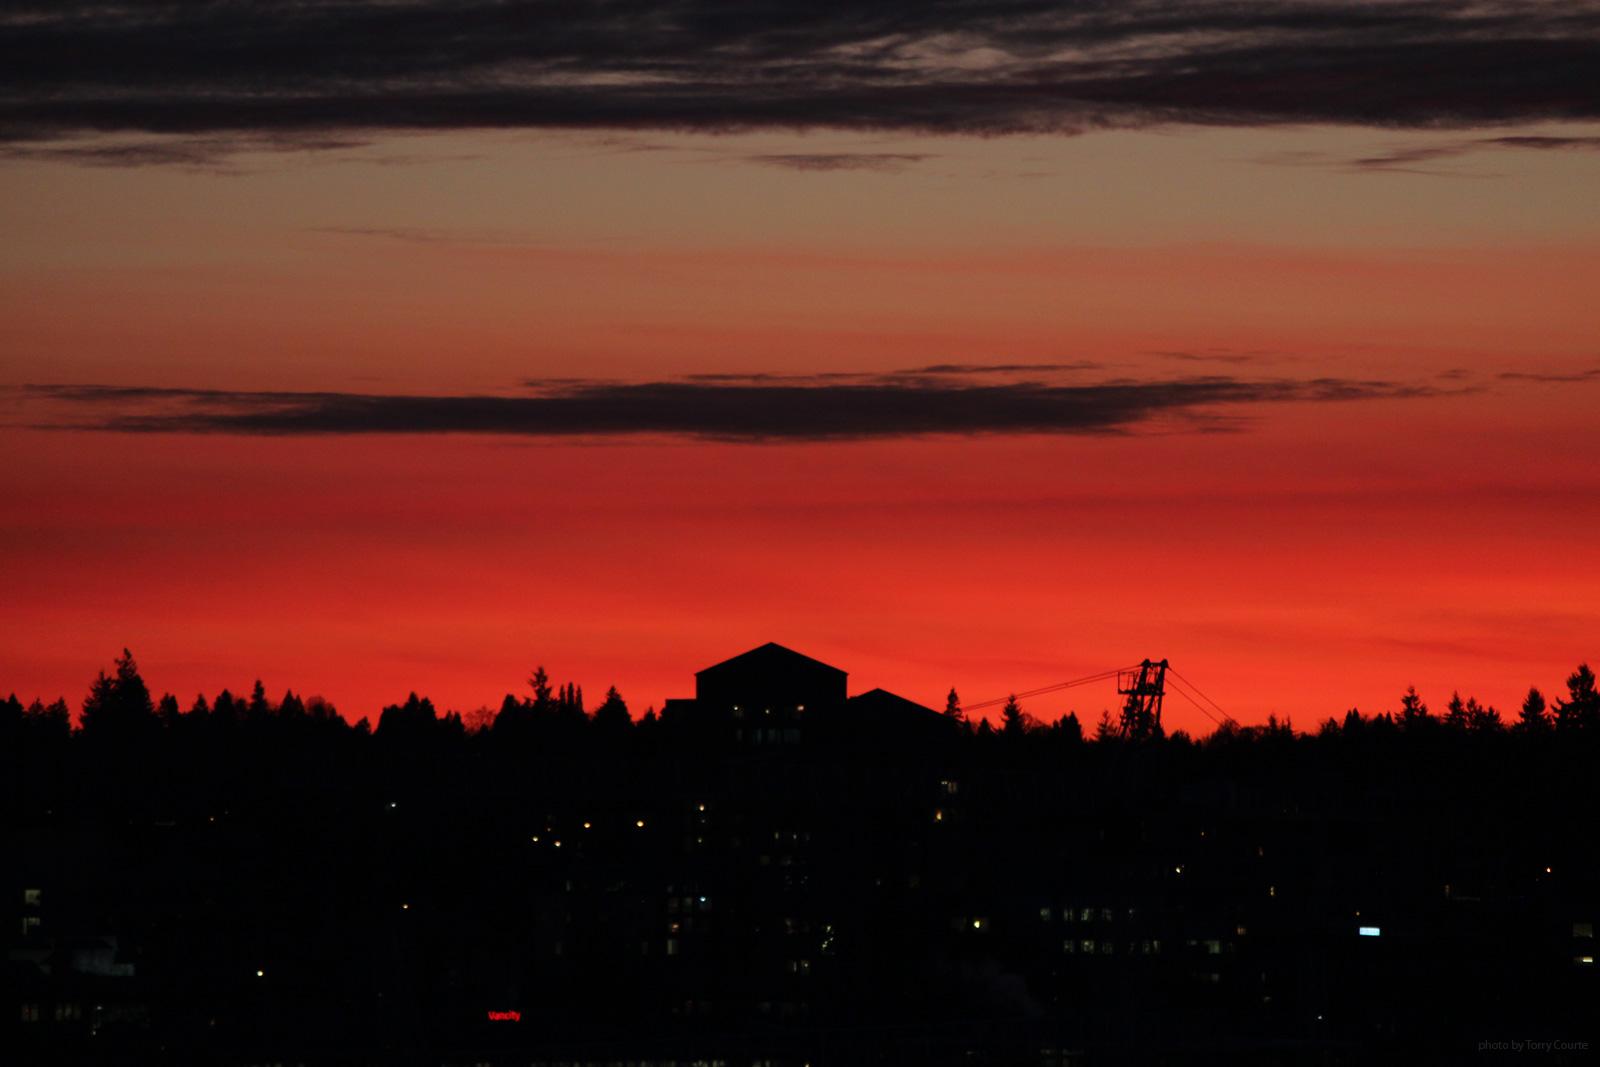 Torry Courte - Sunset Skyline Photograph